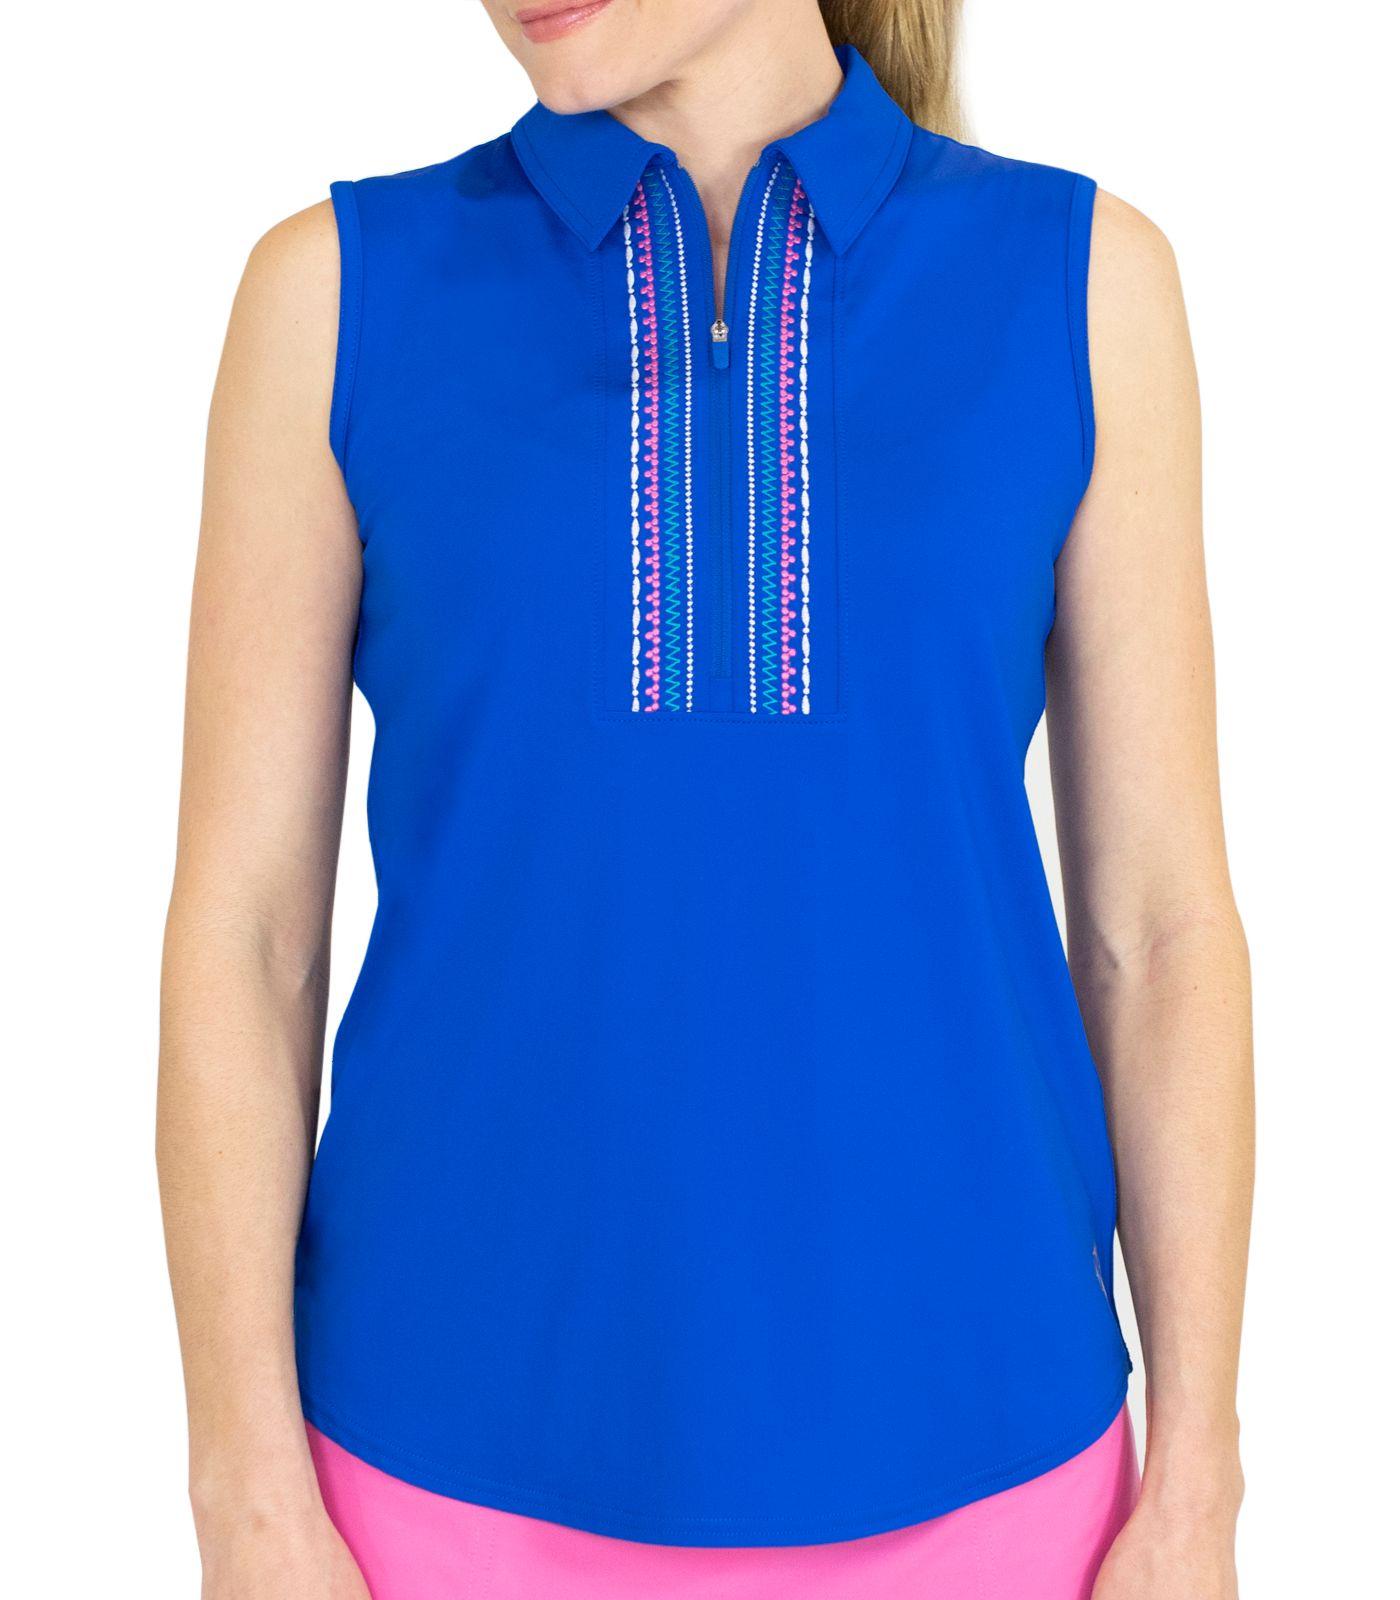 Jofit Women's Sleeveless Embroidered Golf Polo